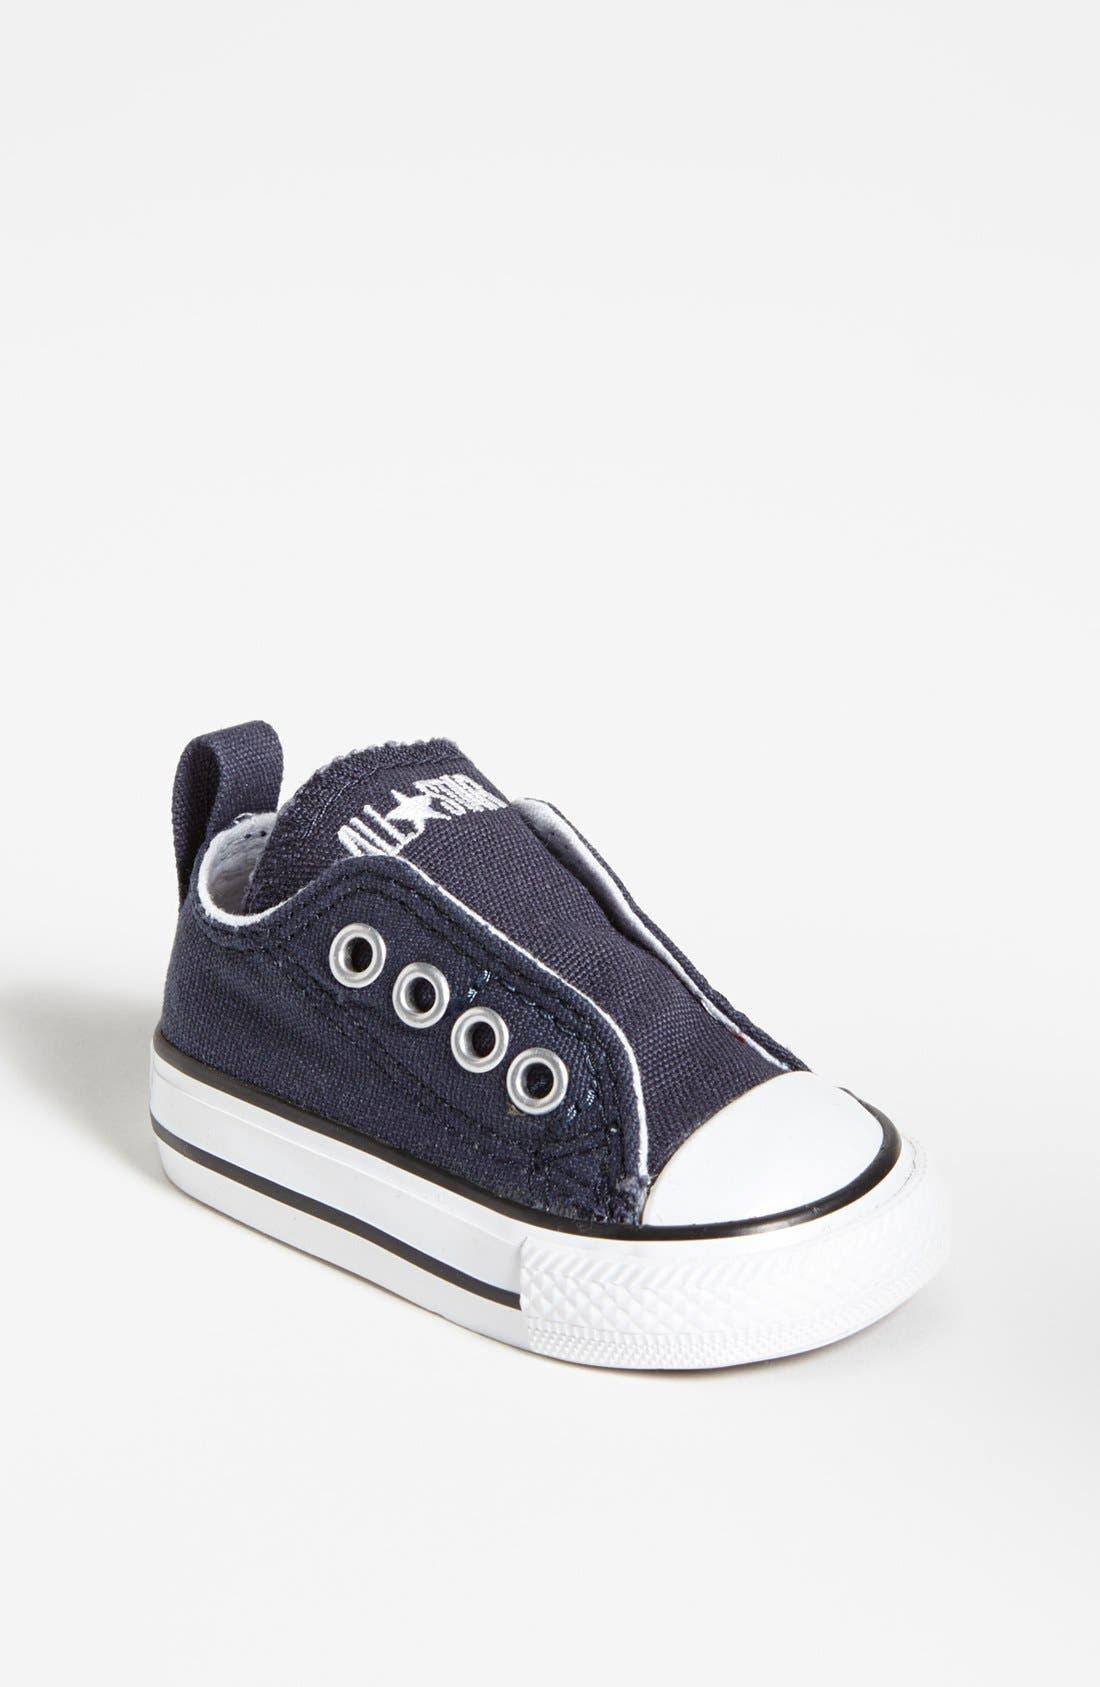 Infant Converse Chuck Taylor All Star Simple SlipOn Size 3 M  Blue